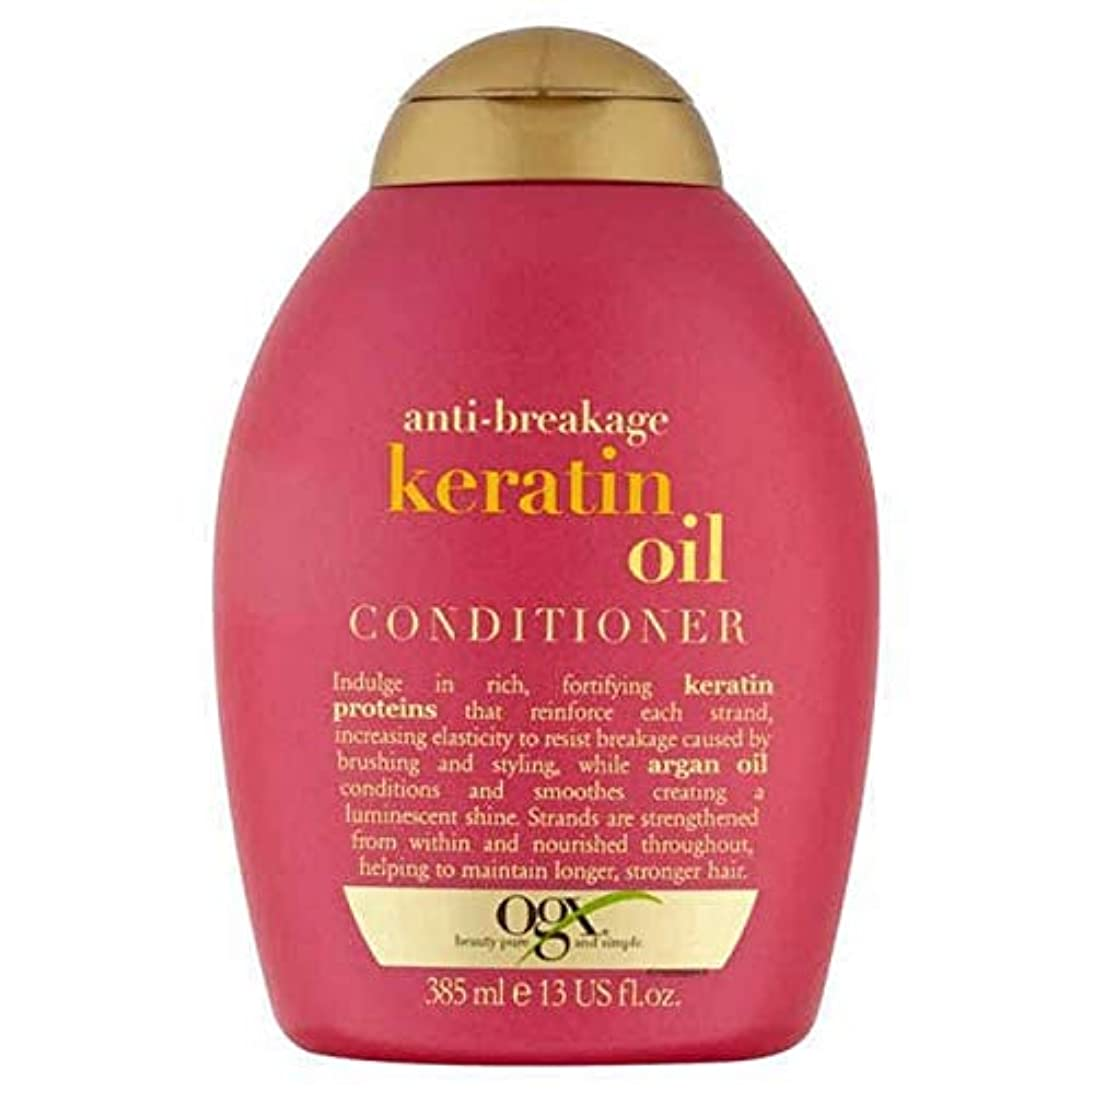 [Ogx] Ogx抗破損ケラチンオイルコンディショナー385ミリリットル - OGX Anti-Breakage Keratin Oil Conditioner 385ml [並行輸入品]